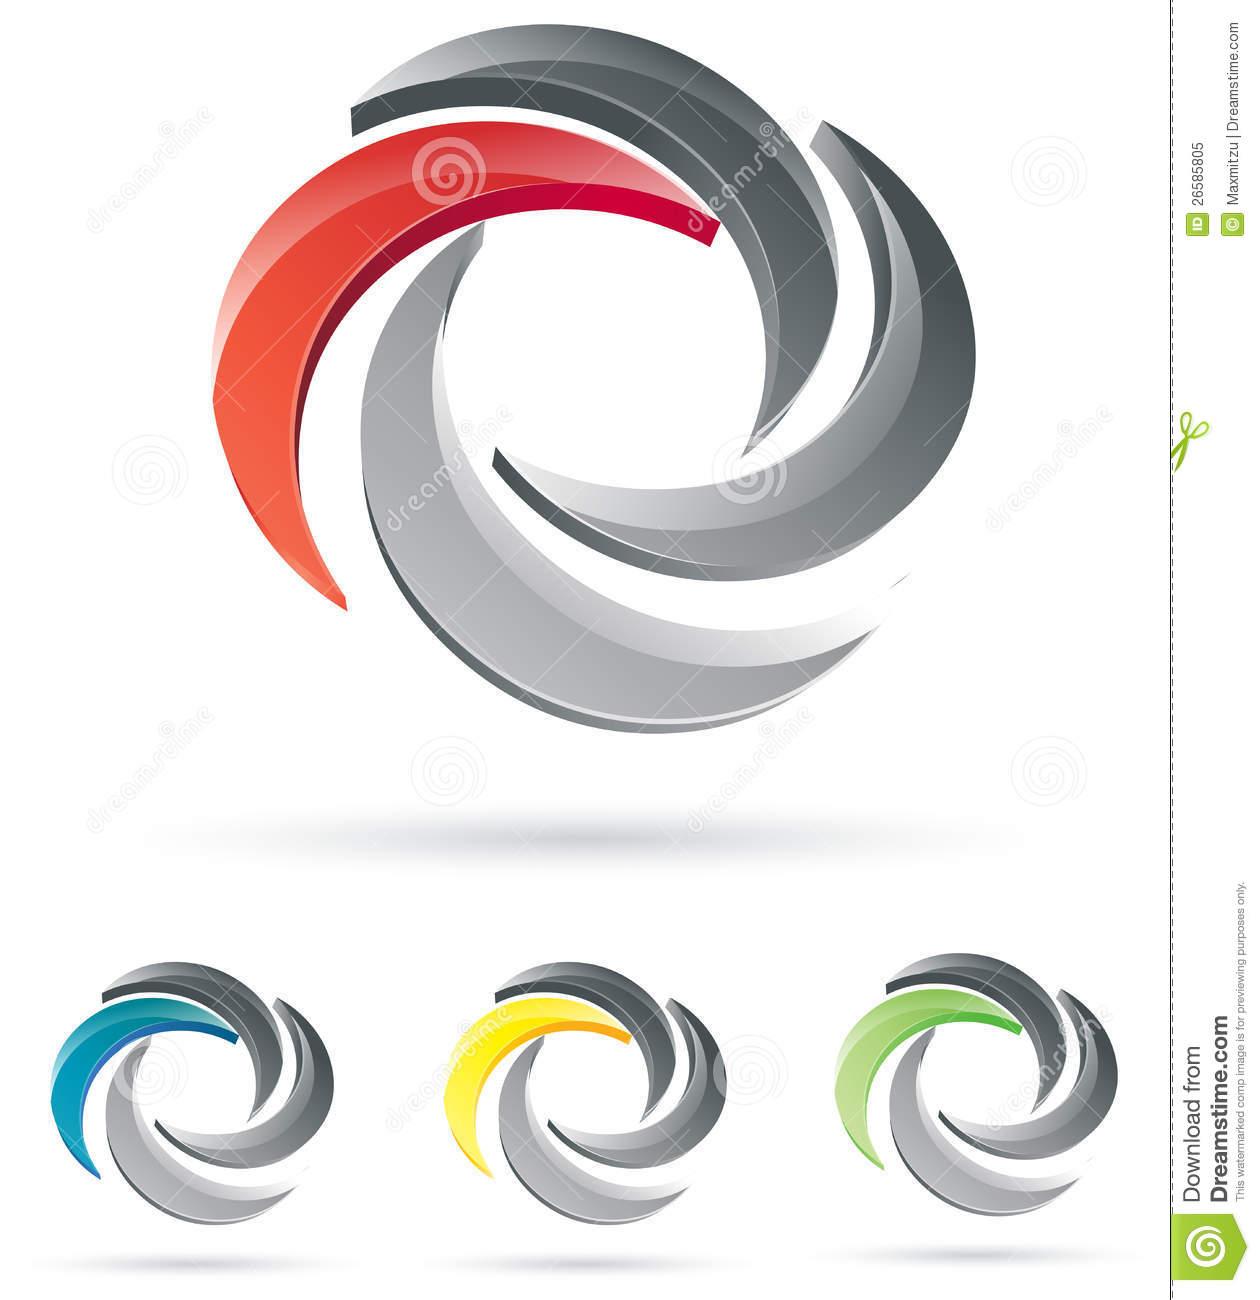 Design Images - Free Business Logo Design, Free Business Logo Design ...